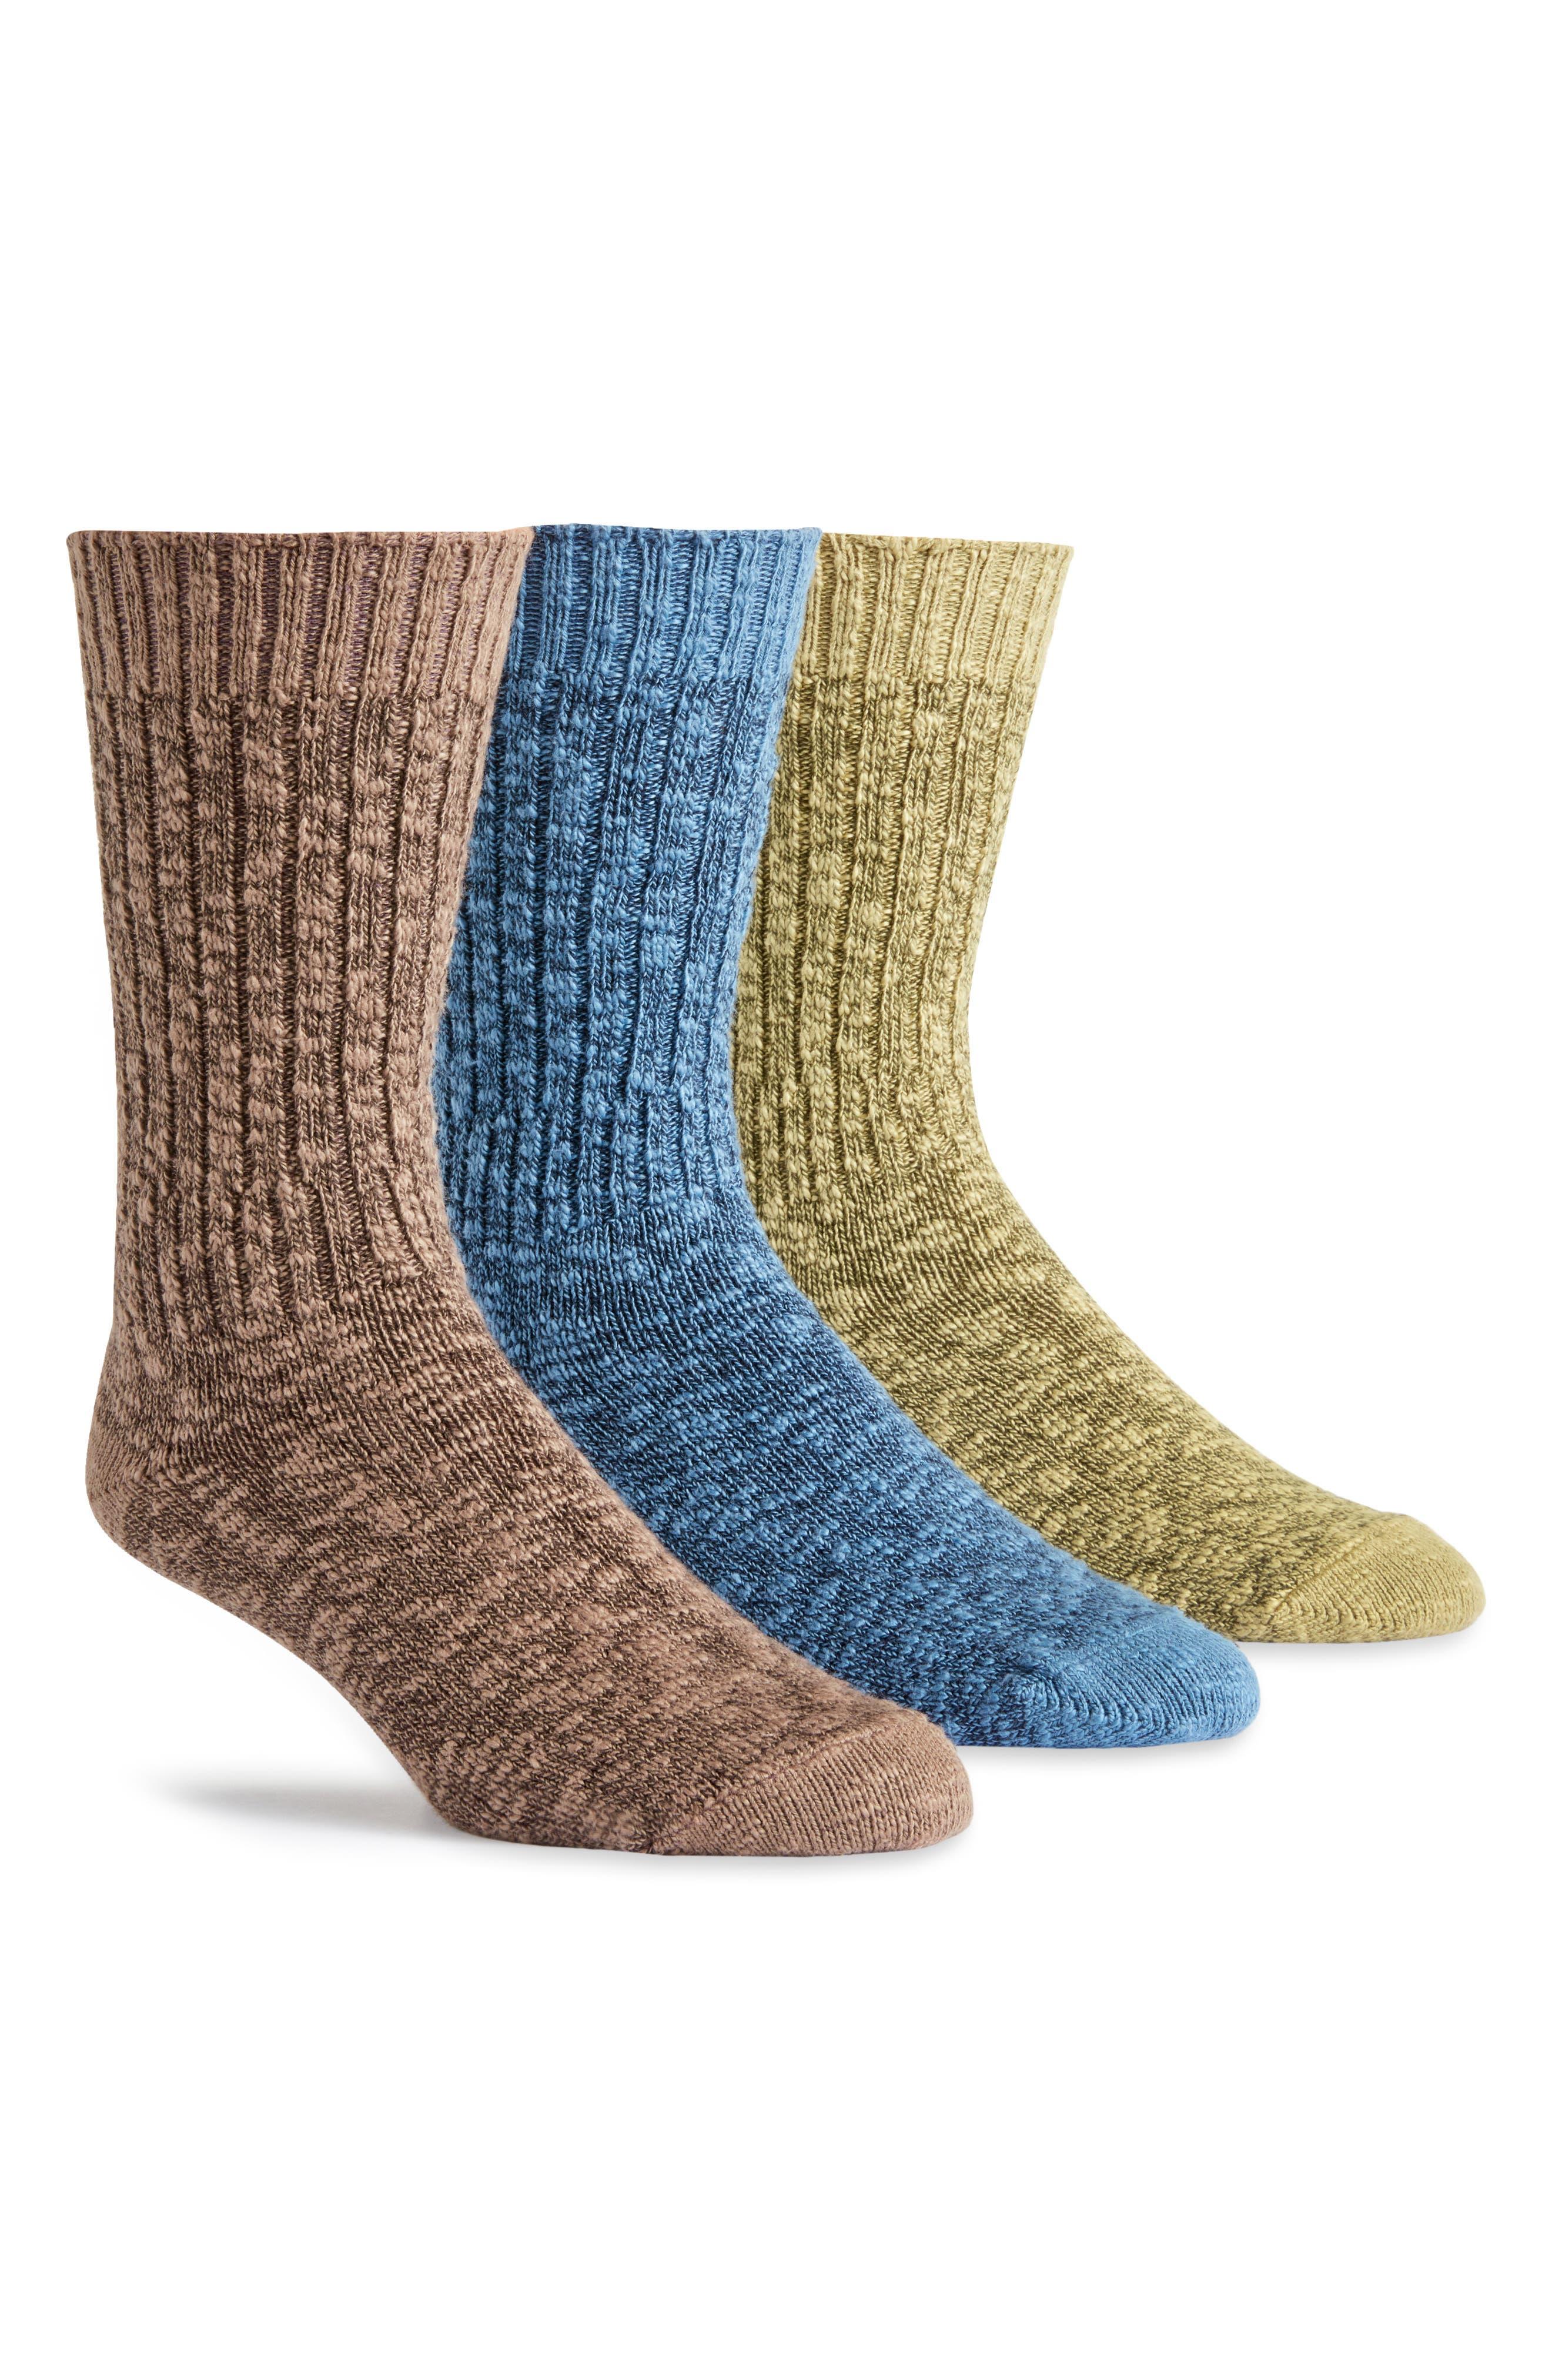 Ragg Assorted 3-Pack Organic Cotton Blend Socks